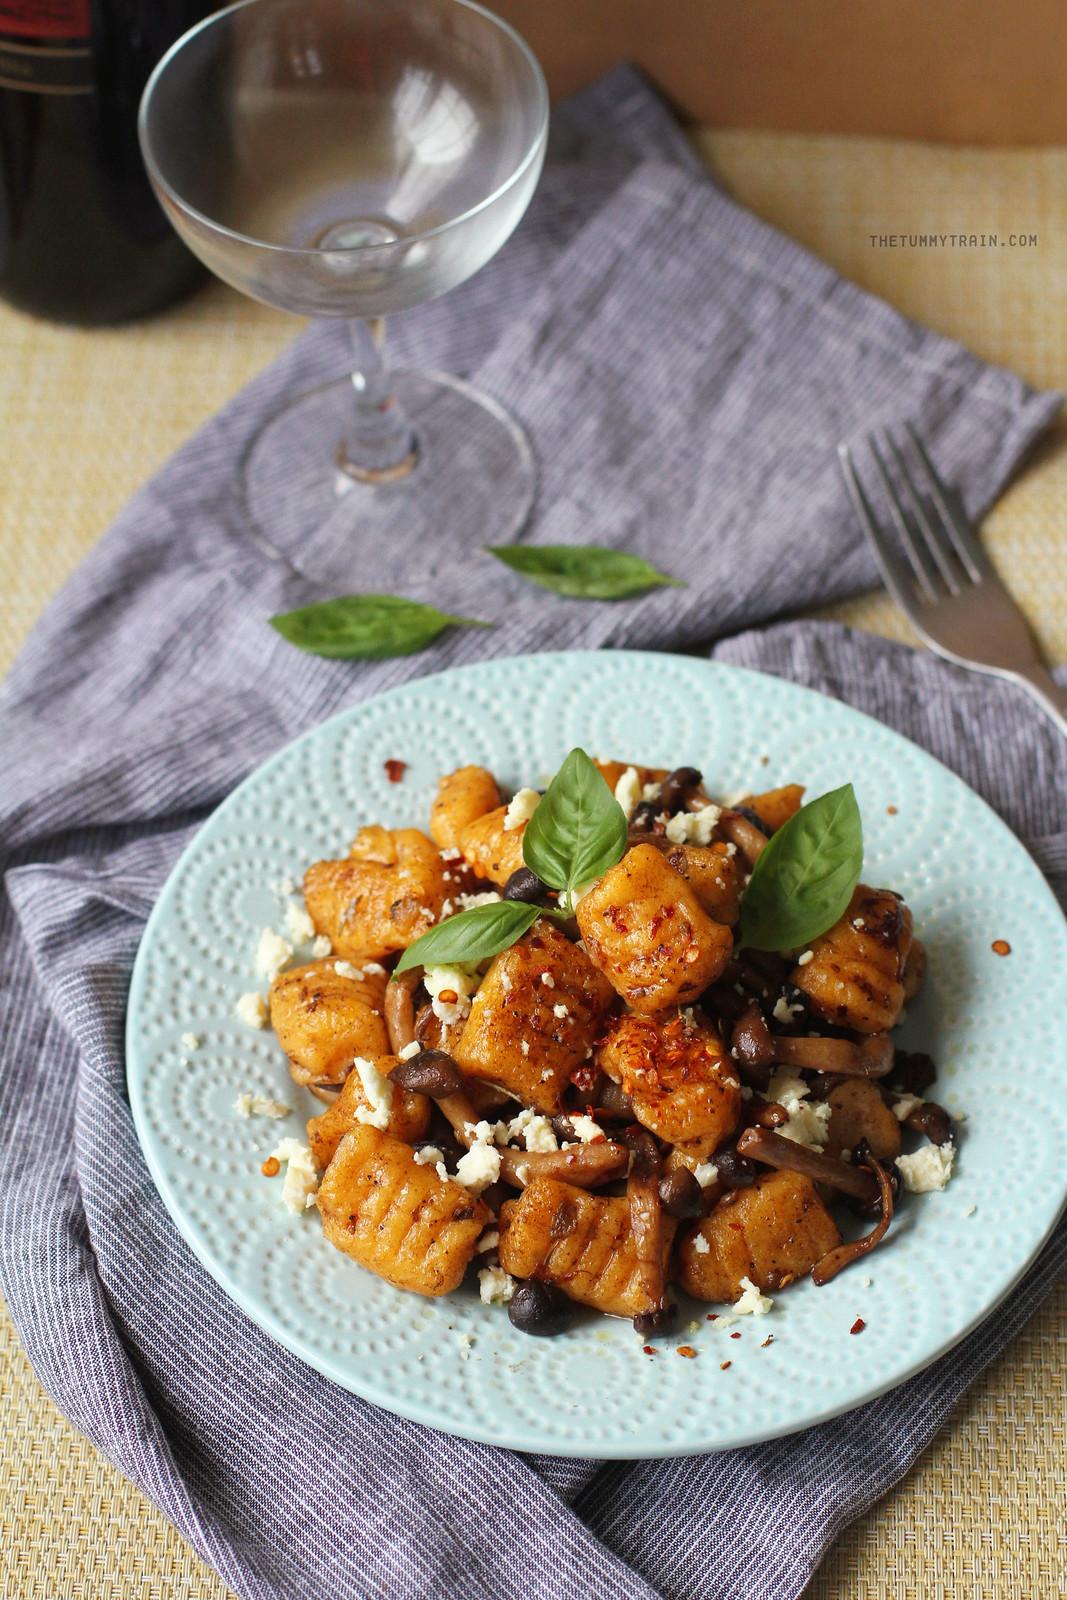 30512178741 2fd8e89c7a h - Striking up a new love affair with this Sweet Potato Gnocchi Recipe